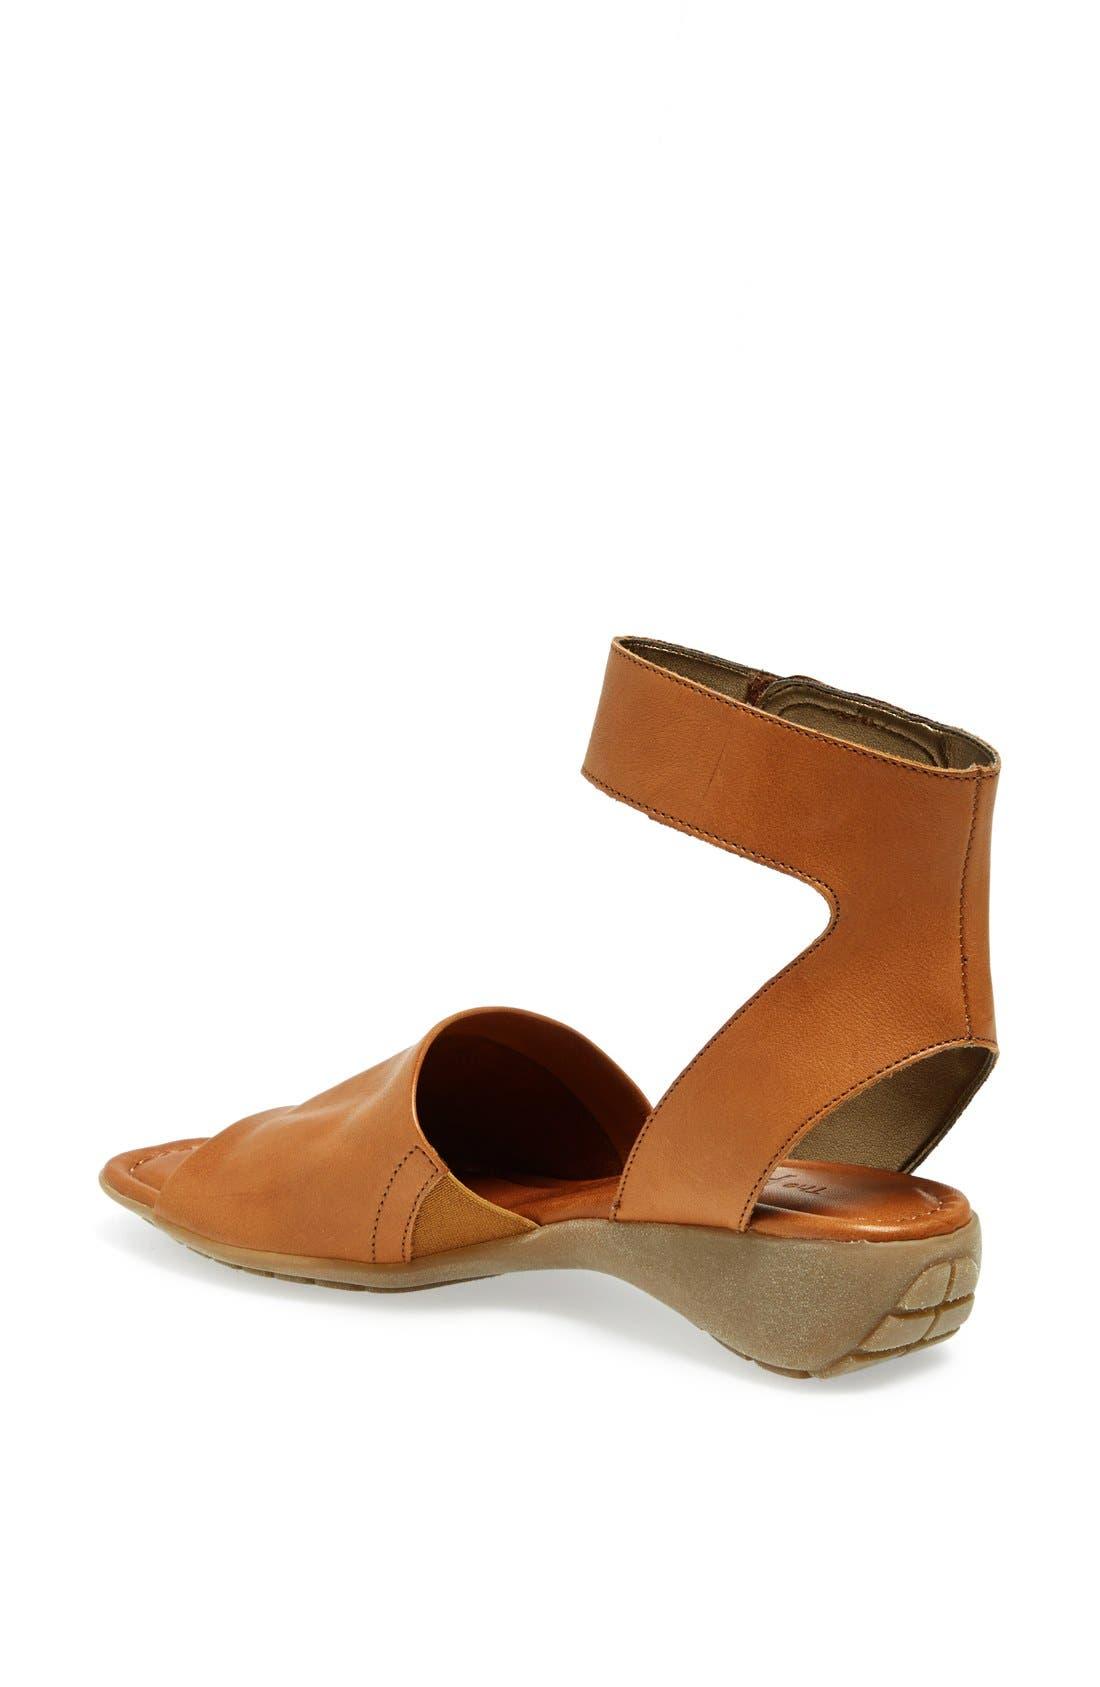 'Beglad' Leather Ankle Strap Sandal,                             Alternate thumbnail 26, color,